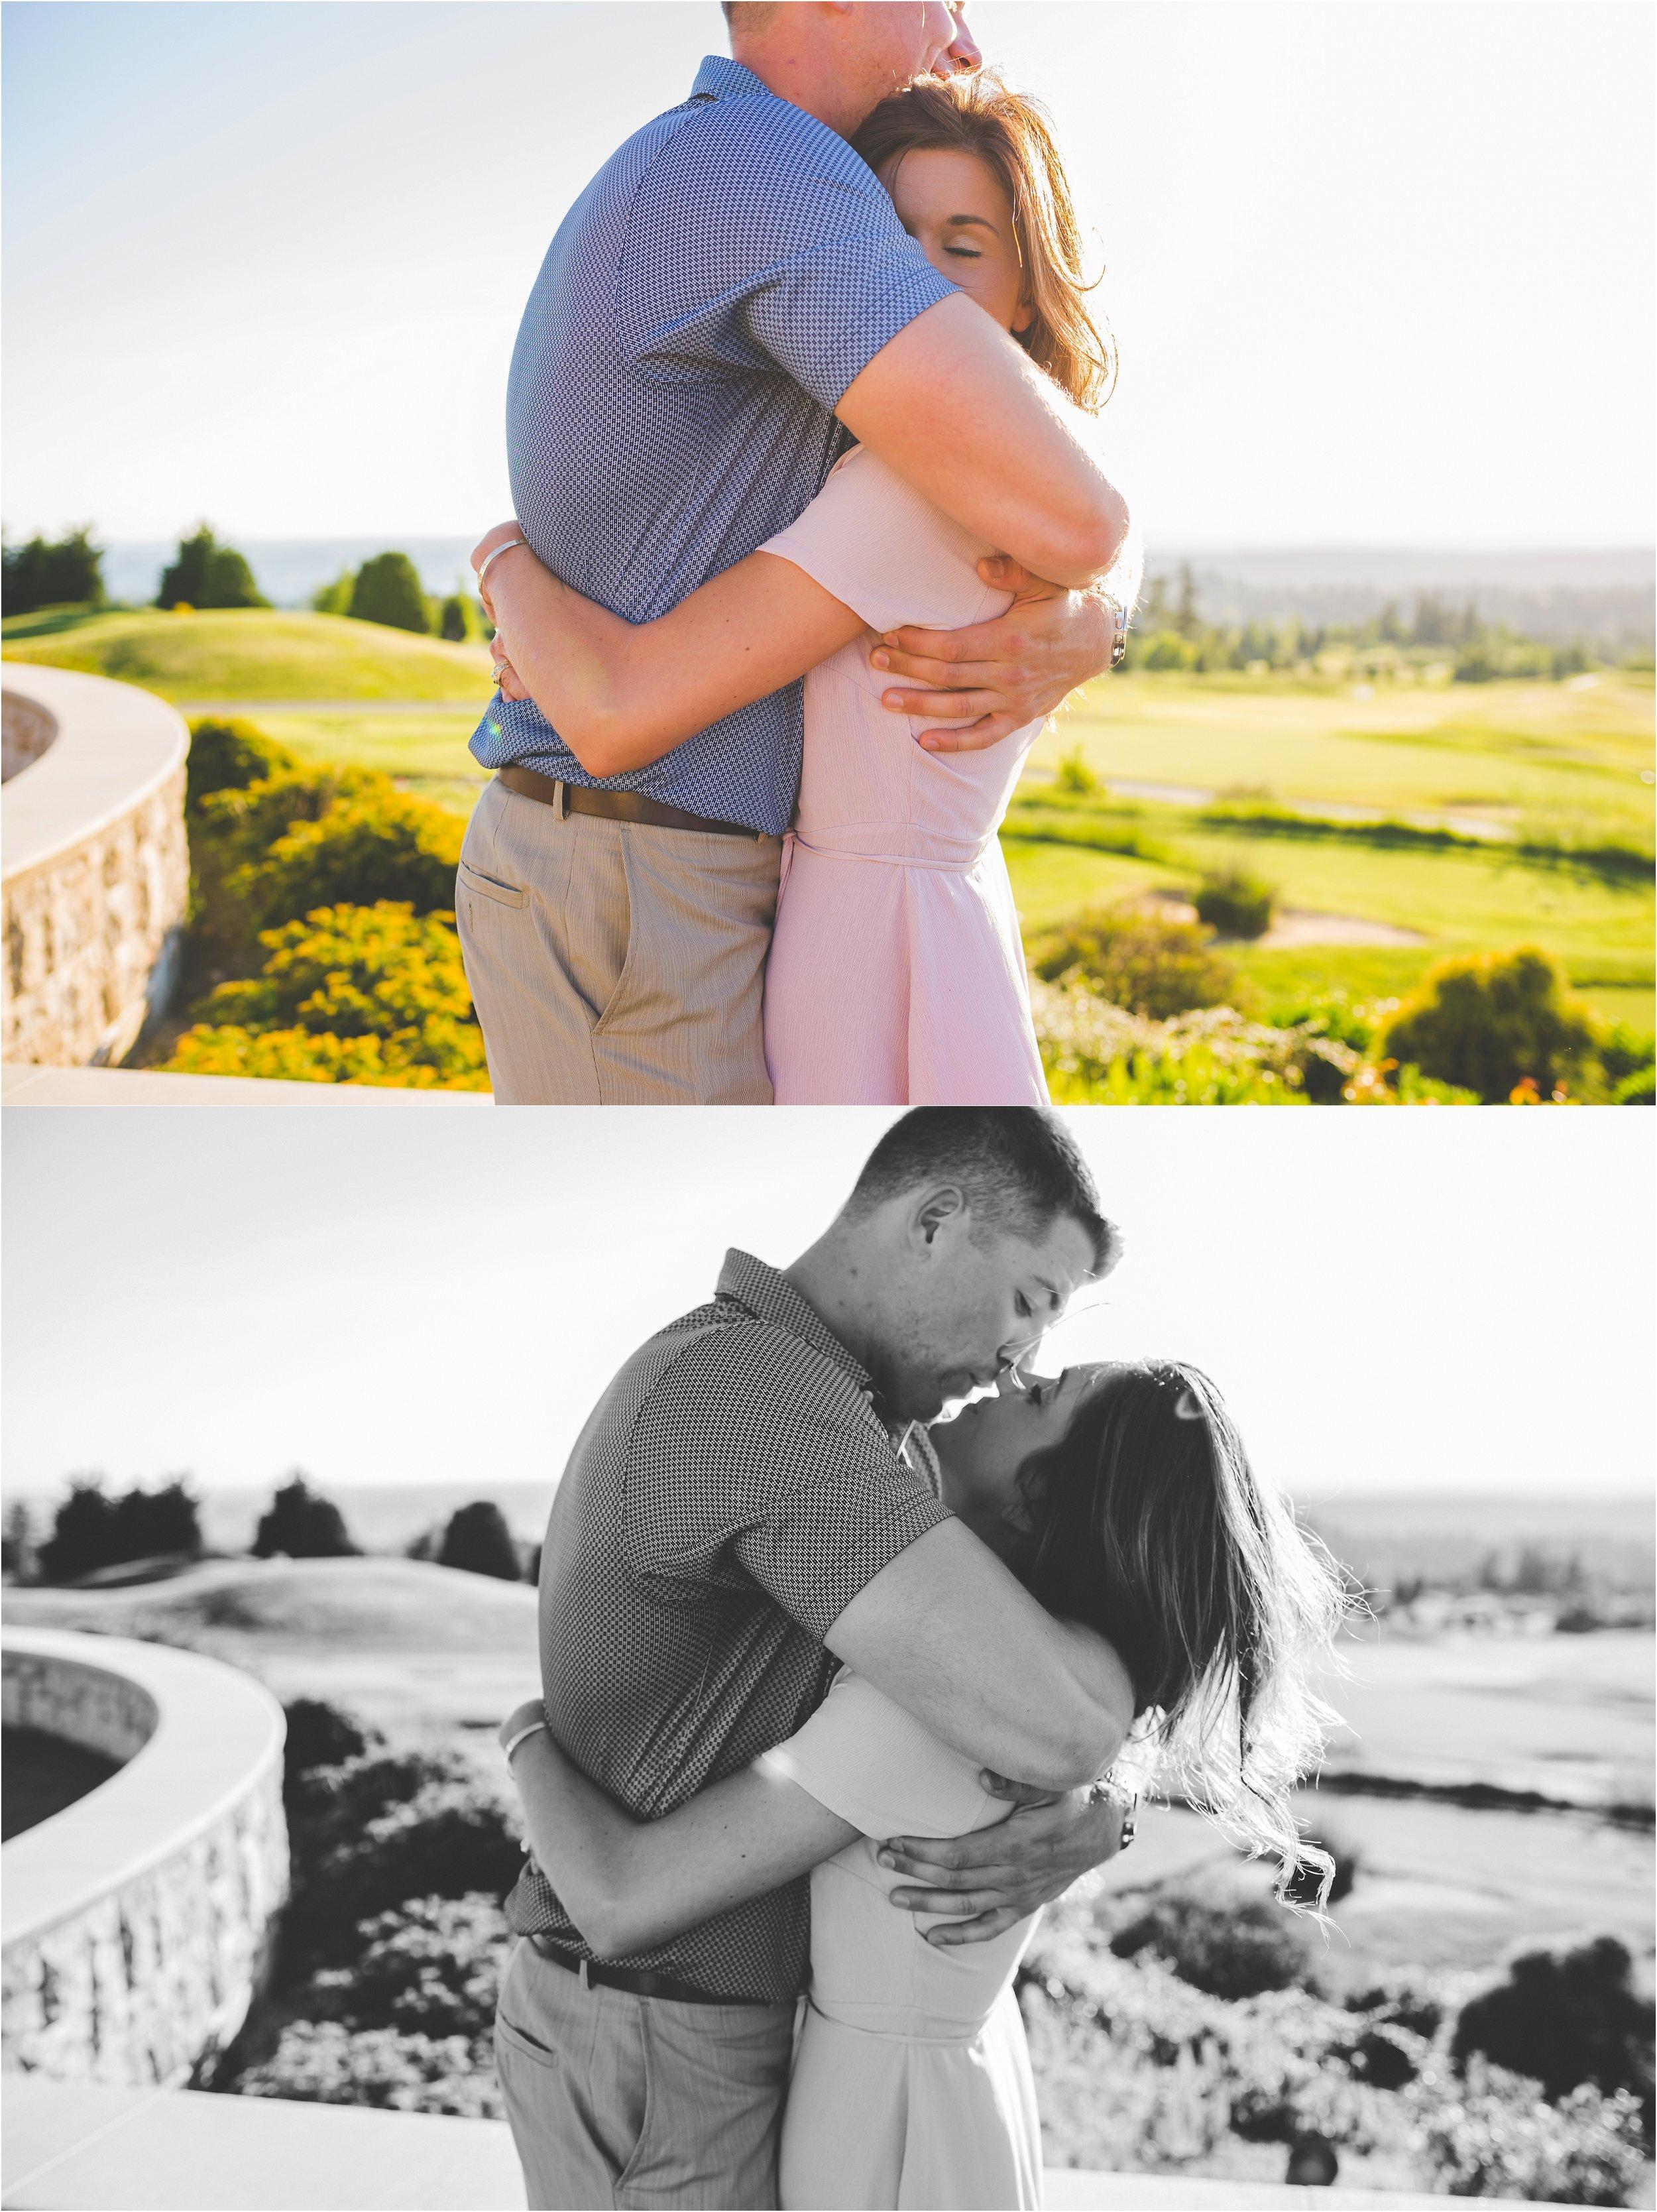 newcastle-golf-club-proposal-jannicka-mayte-seattle-washington-engagement-wedding-photographer_0031.jpg